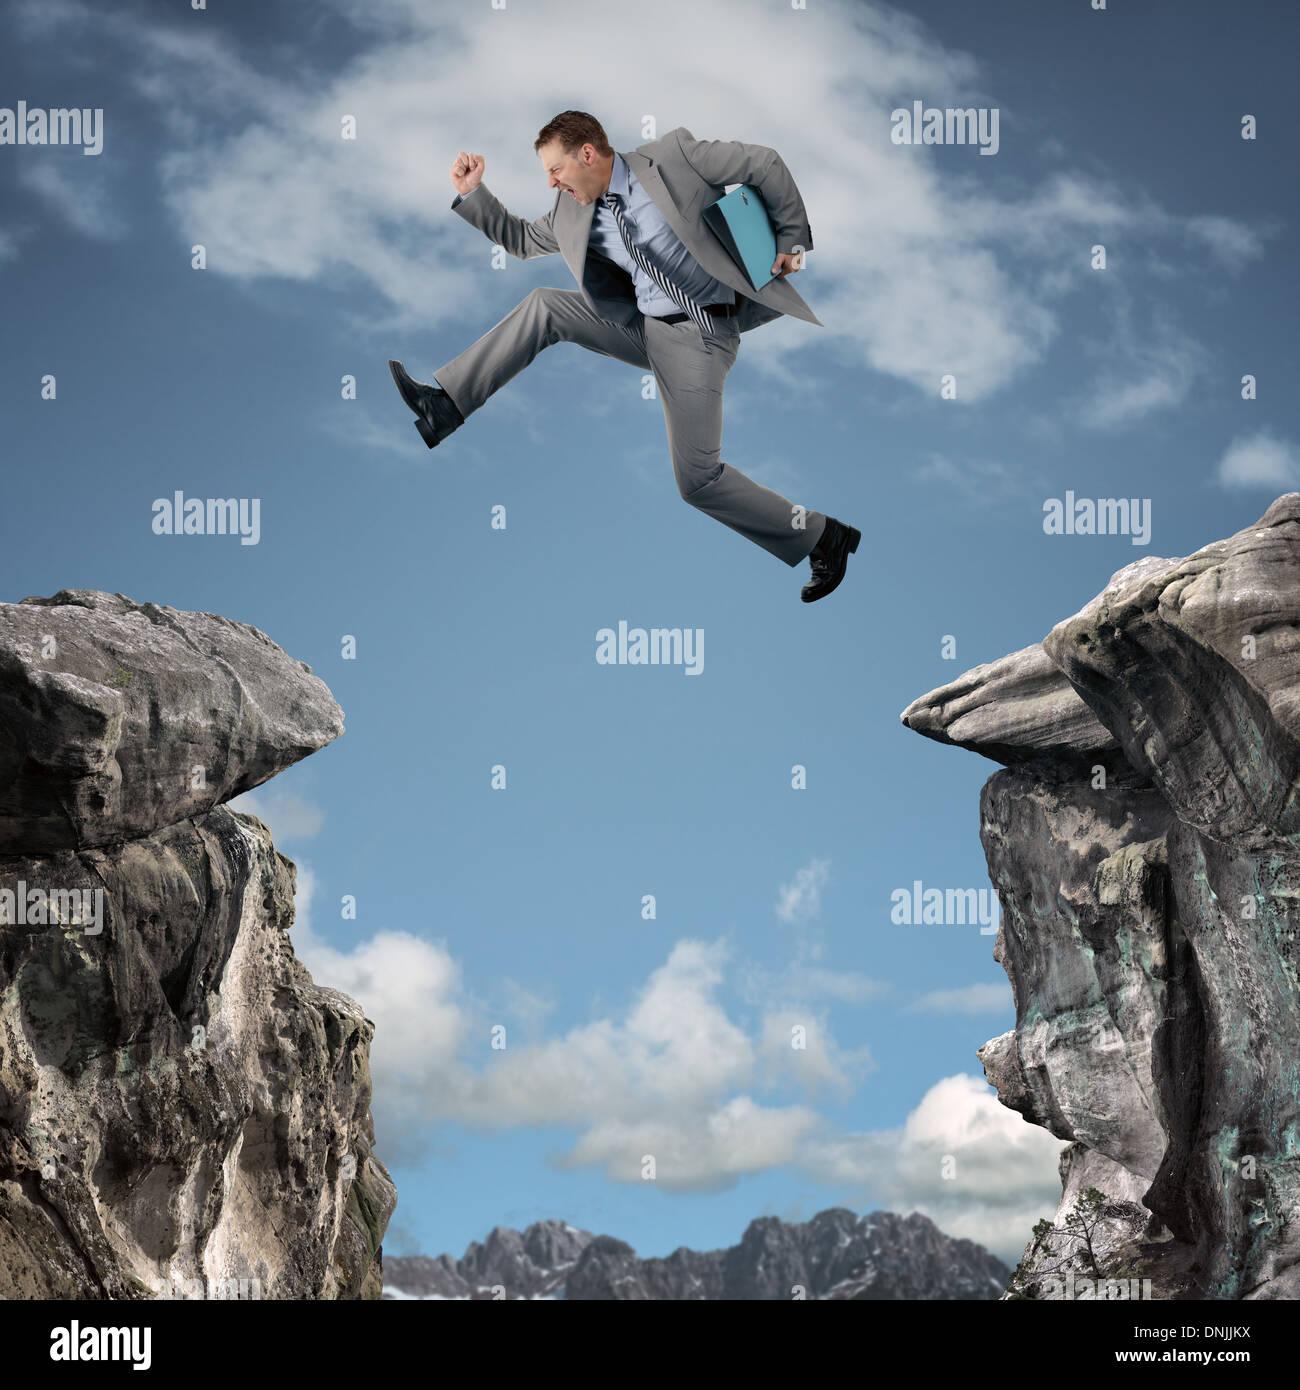 Business adversity - Stock Image